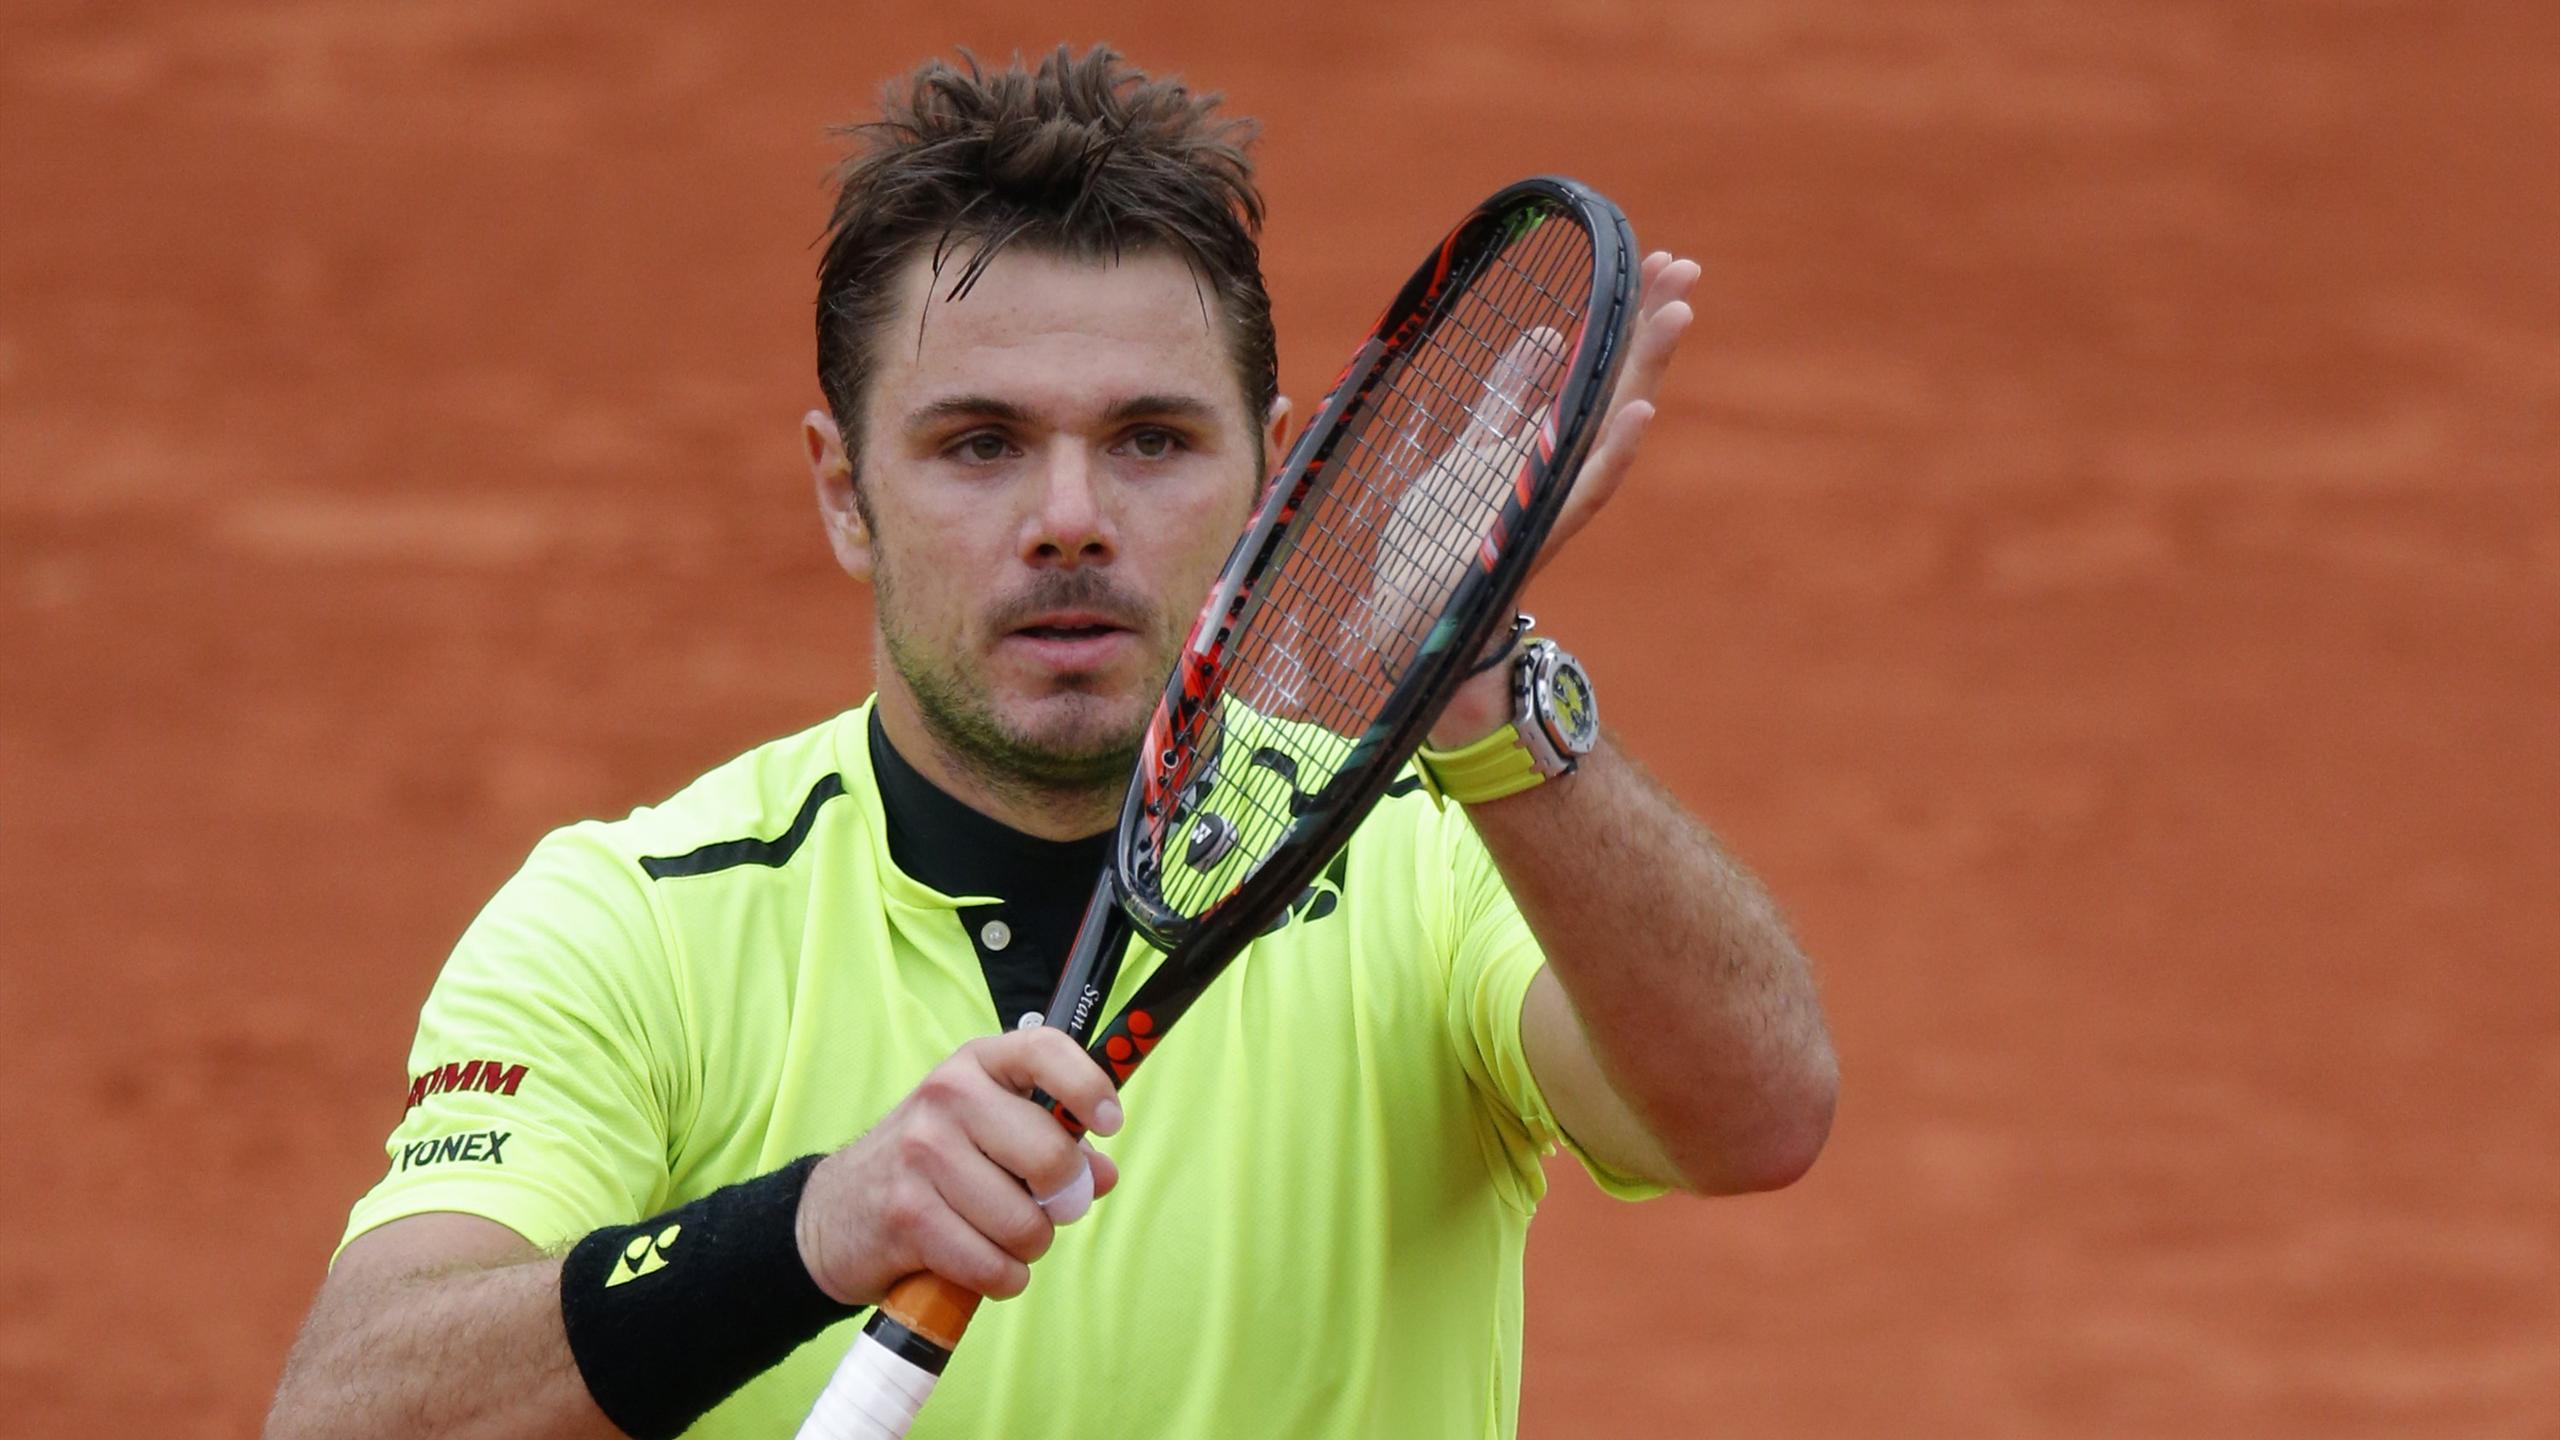 Stanislas Wawrinka celebrates beating Viktor Troicki at the French Open